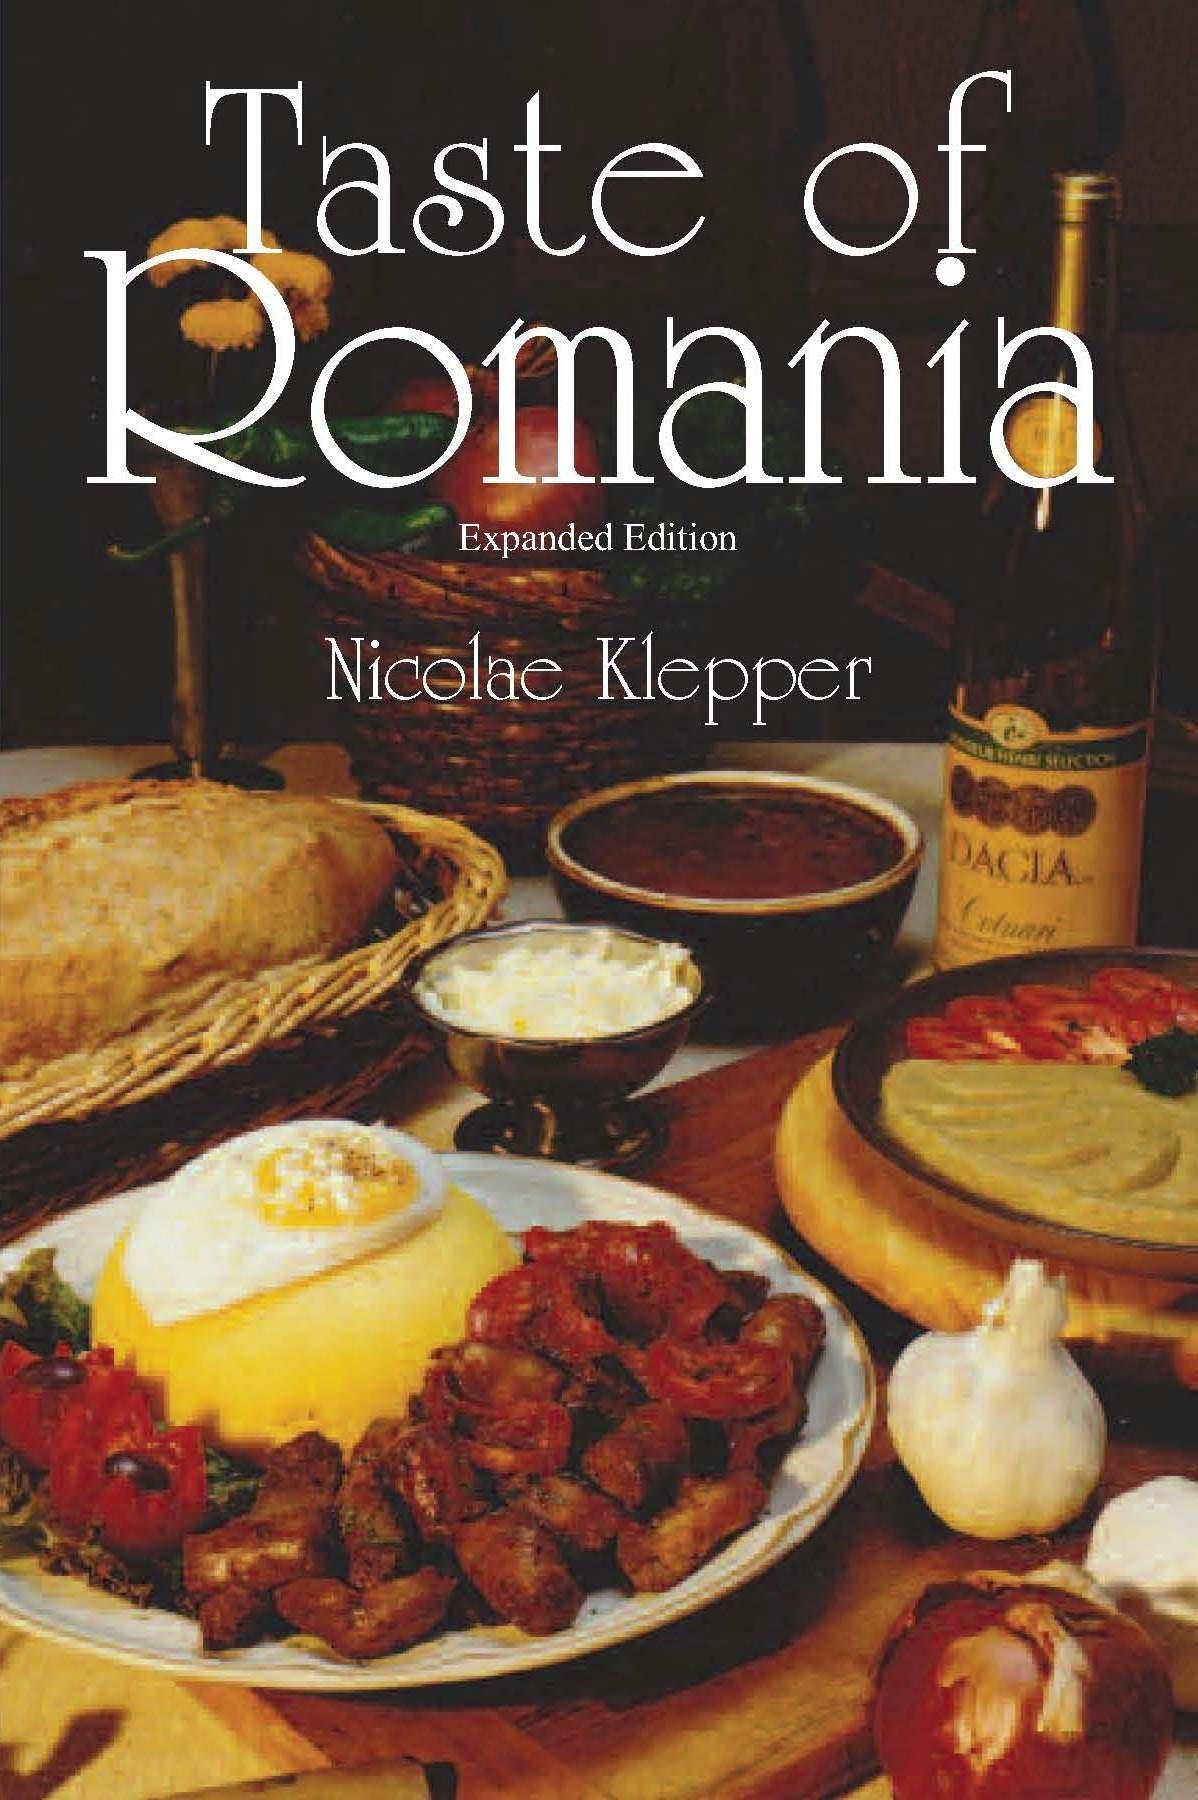 Taste of romania expanded edition nicolae klepper 9780781812641 taste of romania expanded edition nicolae klepper 9780781812641 amazon books forumfinder Choice Image